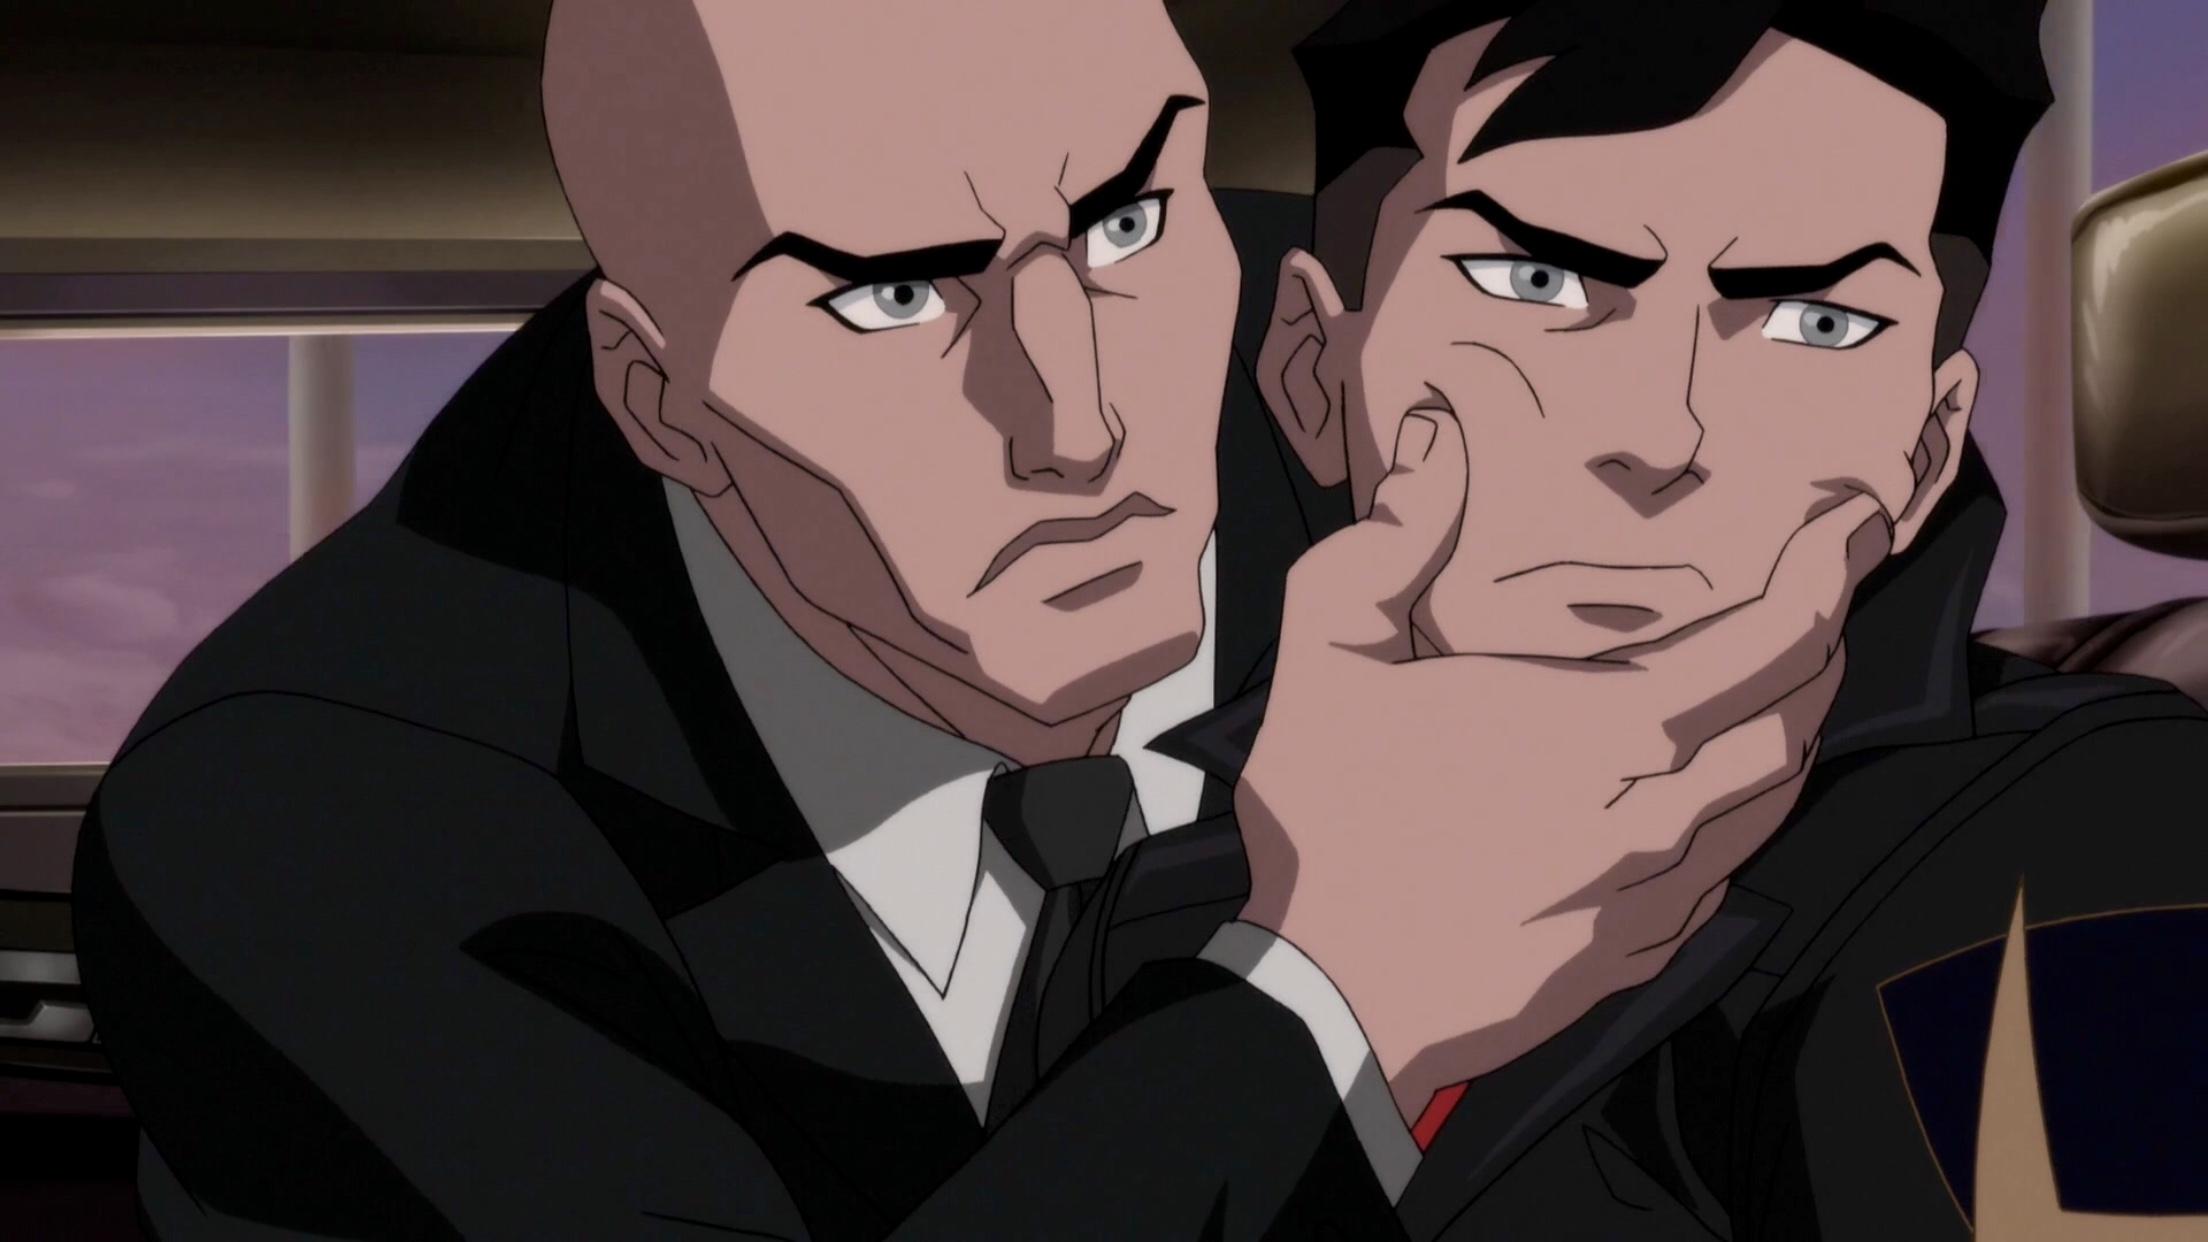 Rainn Wilson and Cameron Monaghan in The Death and Return of Superman (2019)